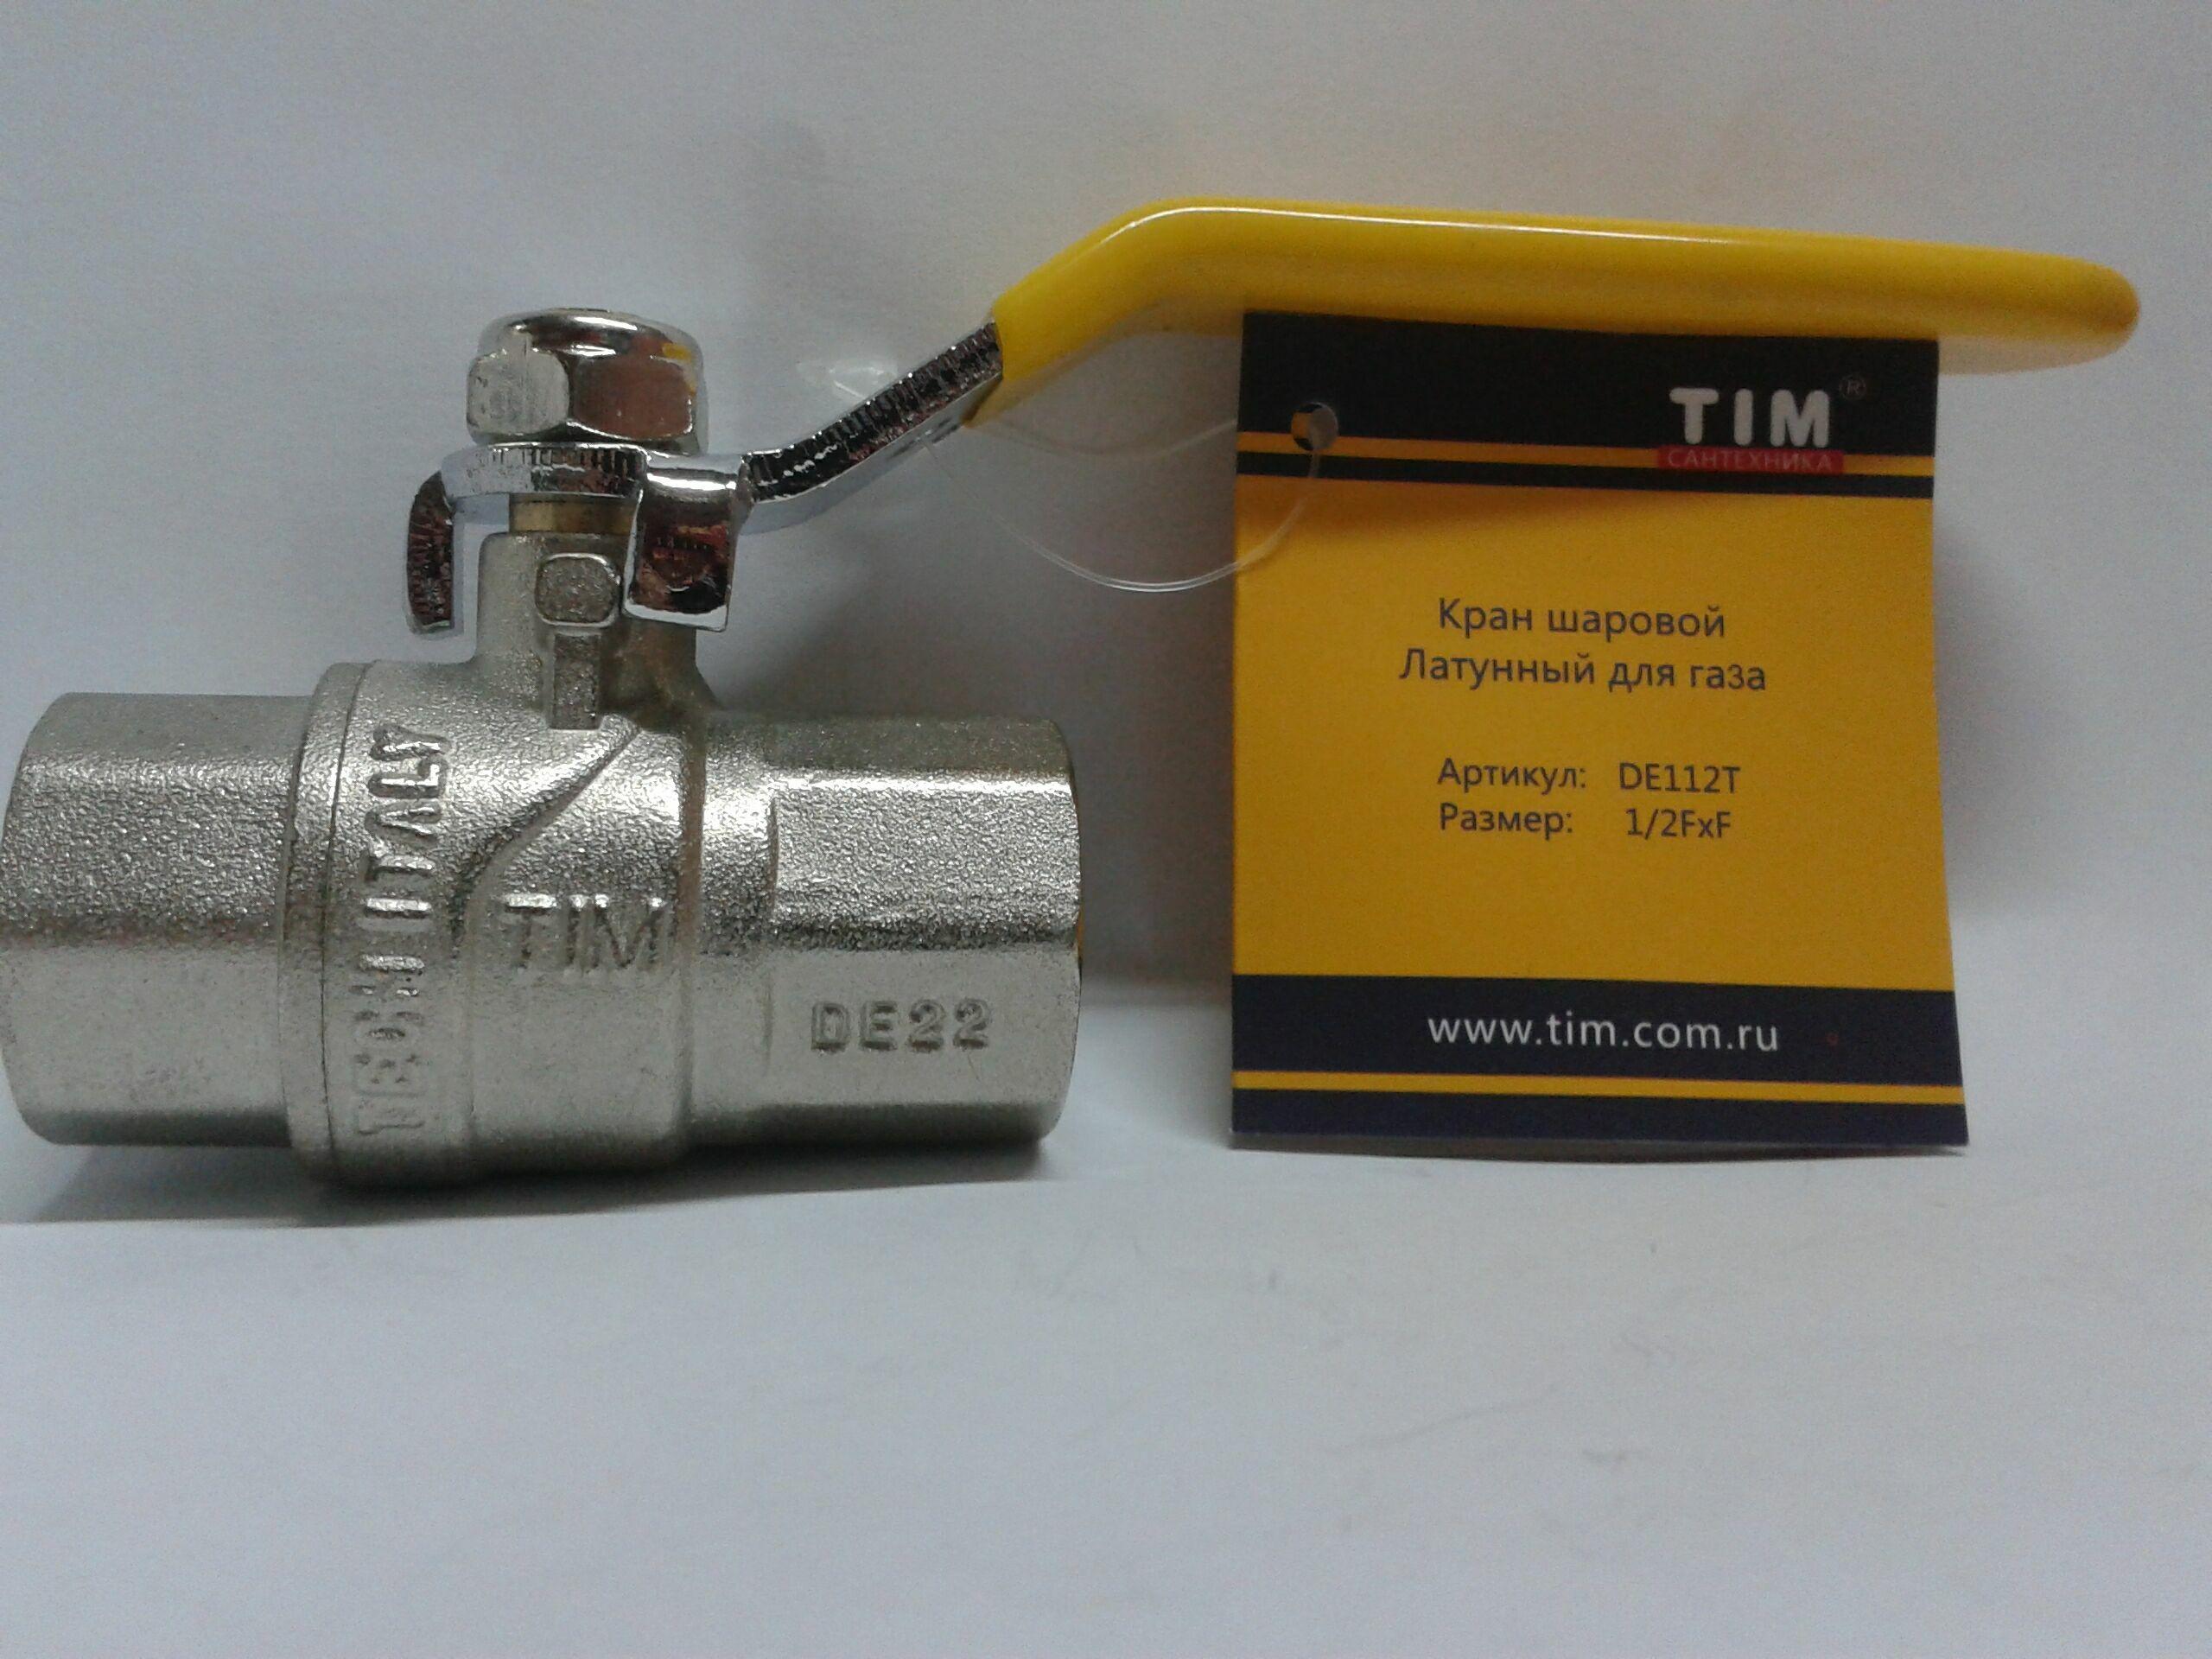 Замена газового крана с соблюдением правил безопасности - точка j